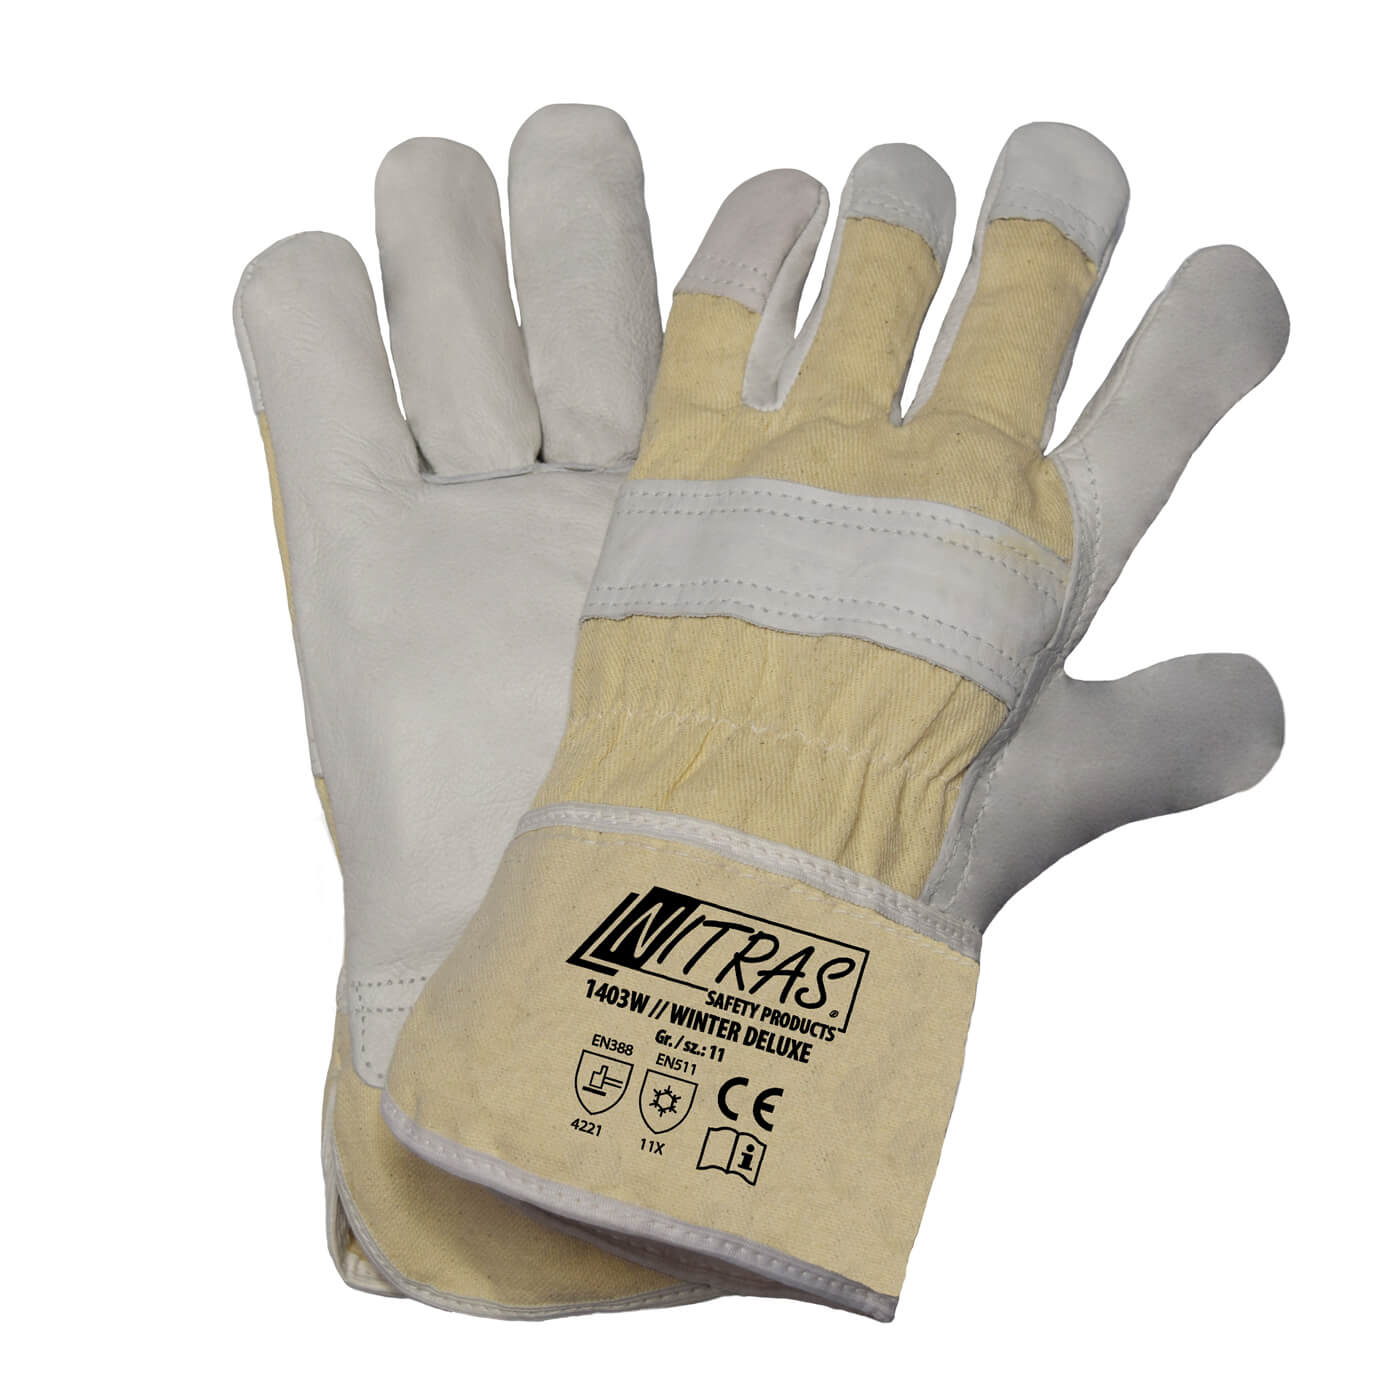 Rękawice zimowe Nitras 1403W/ WINTER WORKER